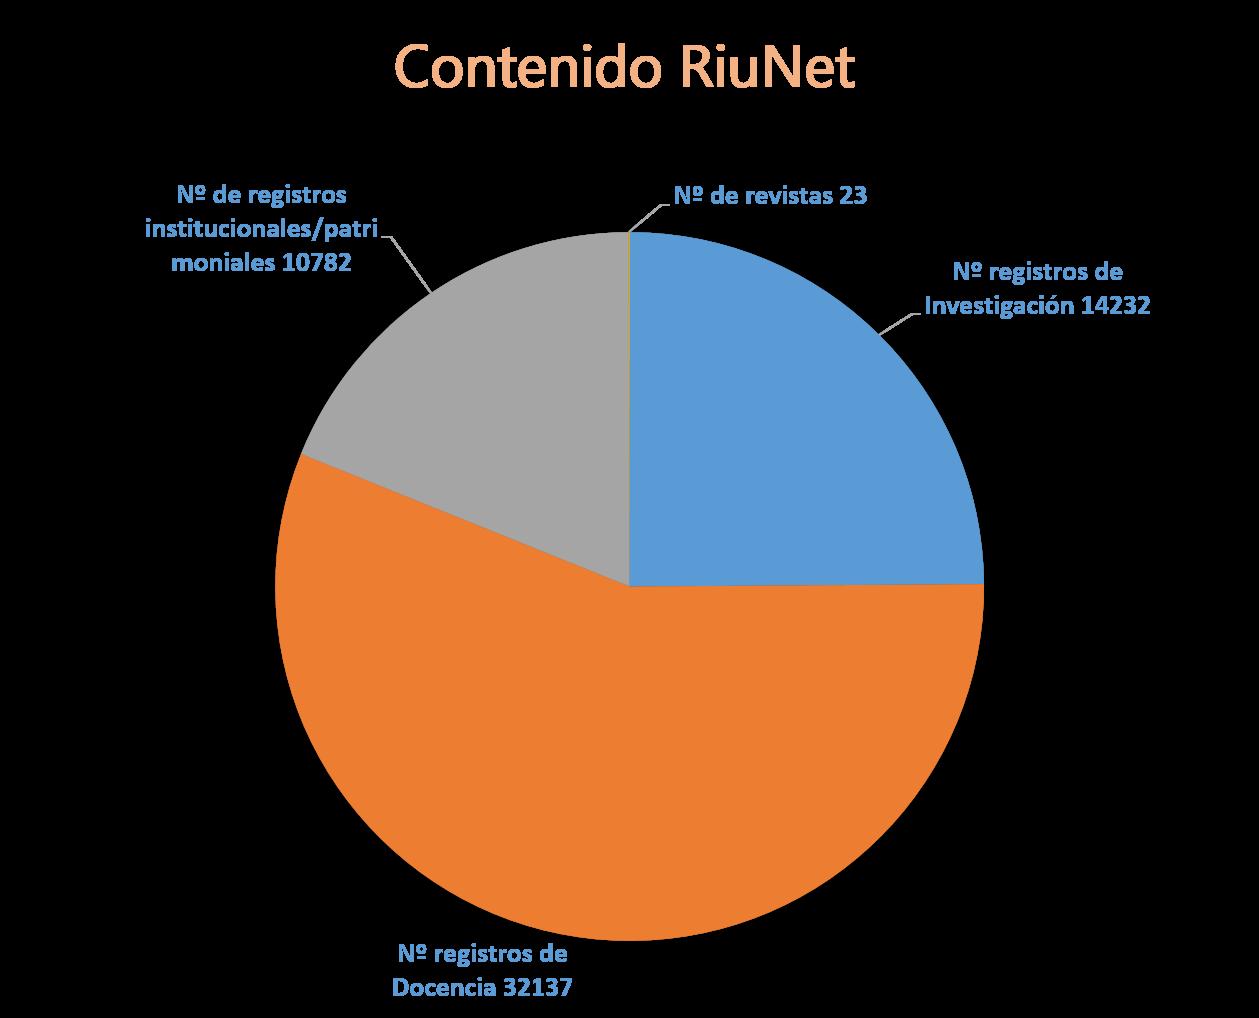 Contenido_Riunet